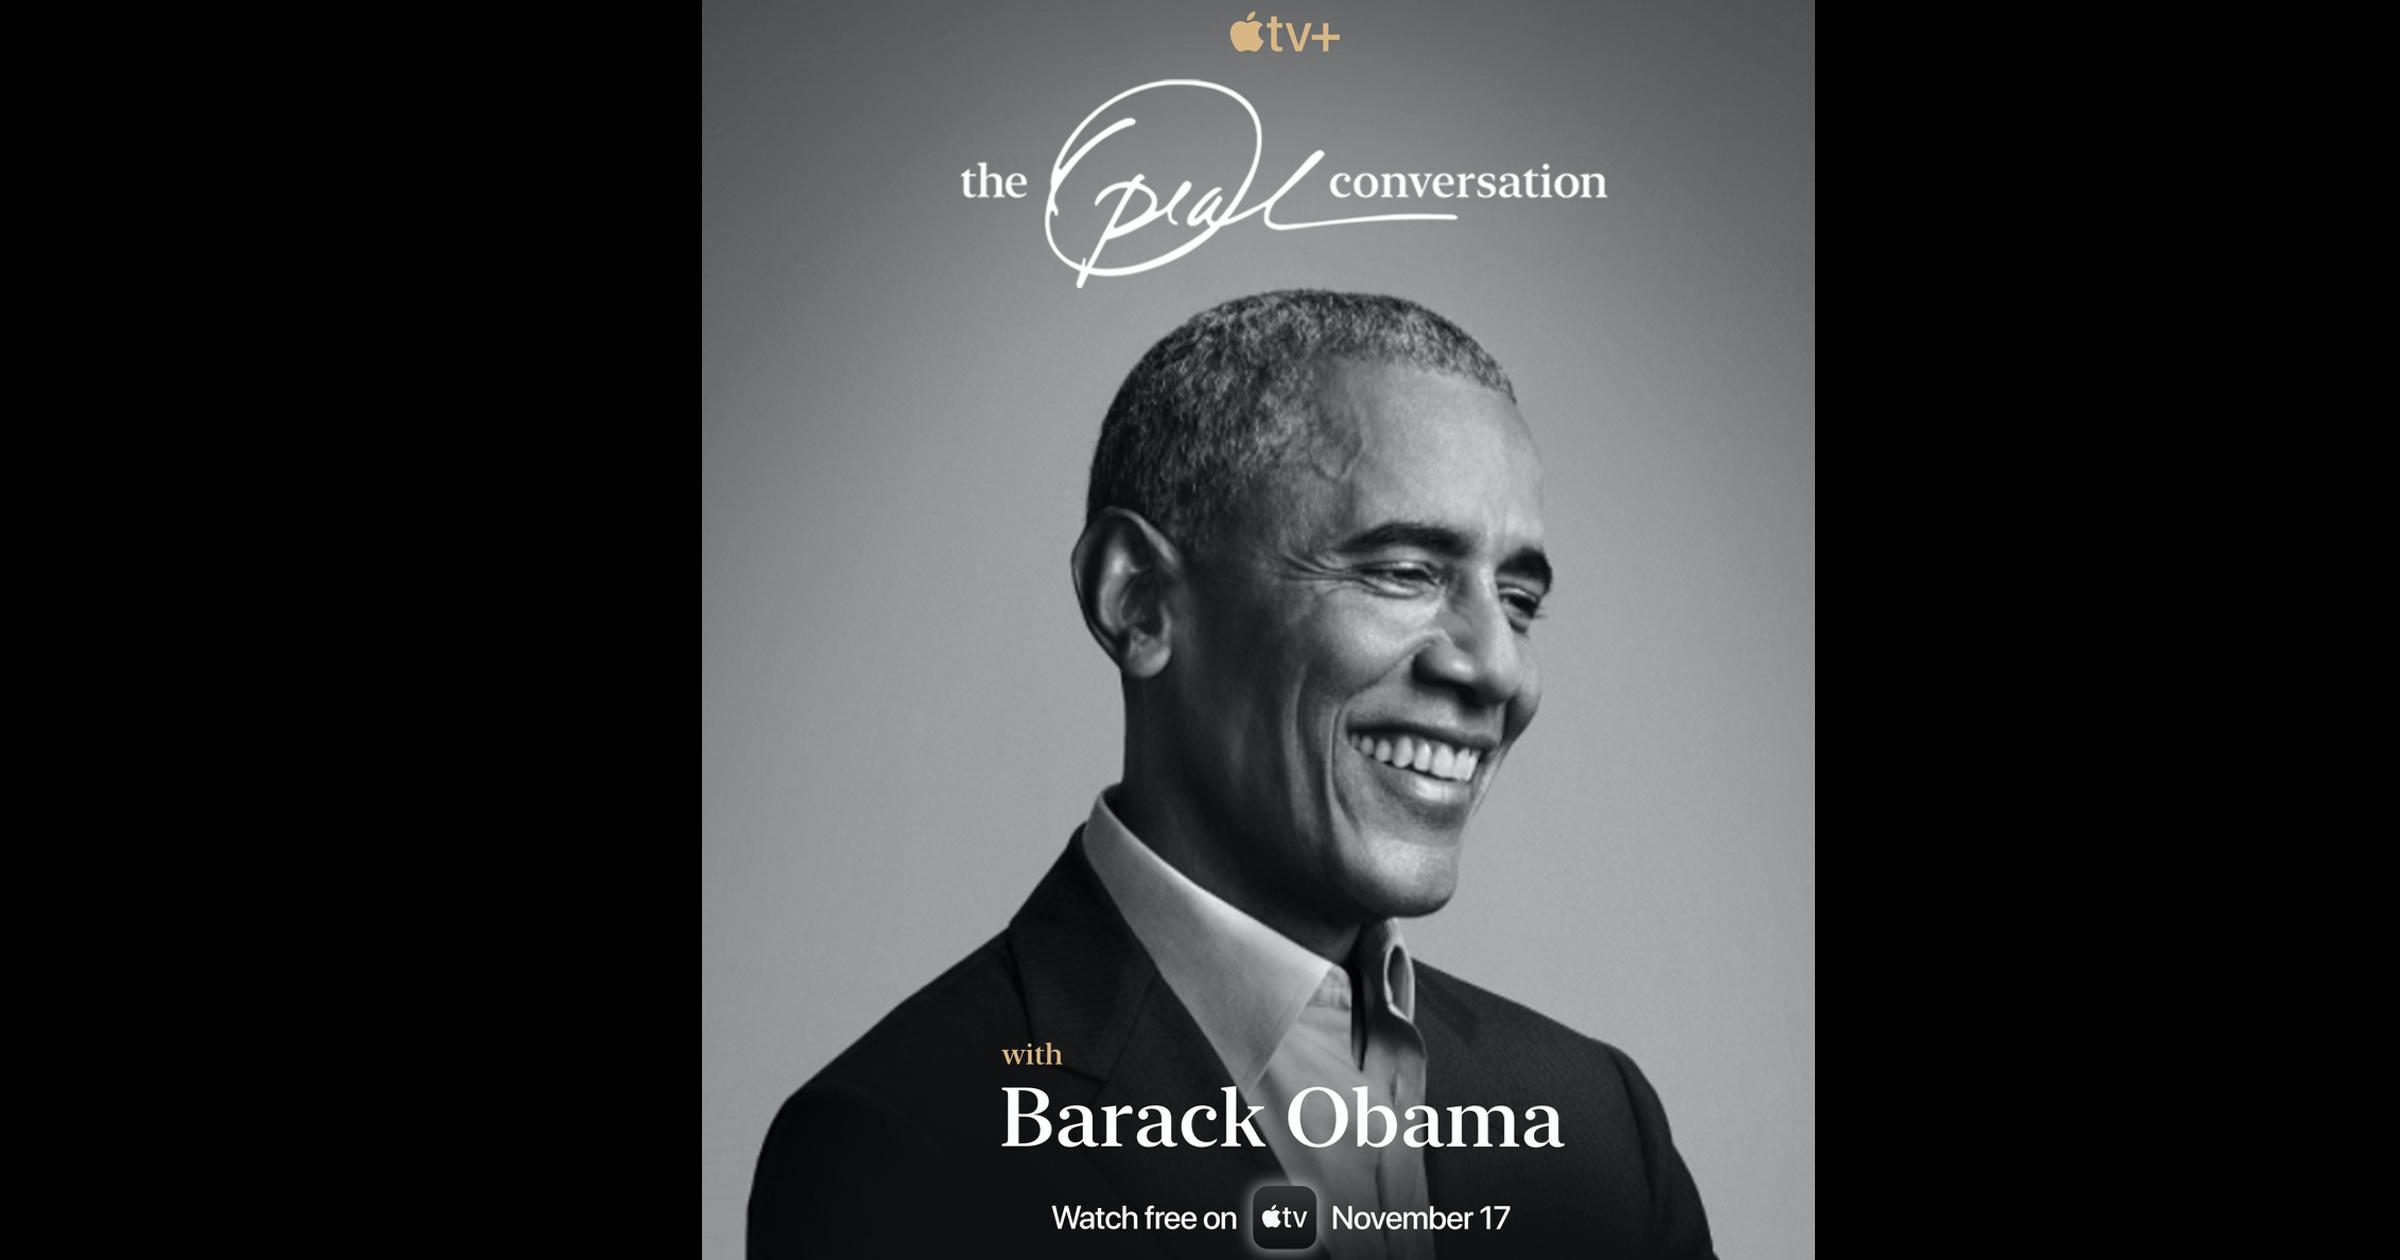 Barack Obama book cover for Oprah Winfrey Interview on Apple TV+